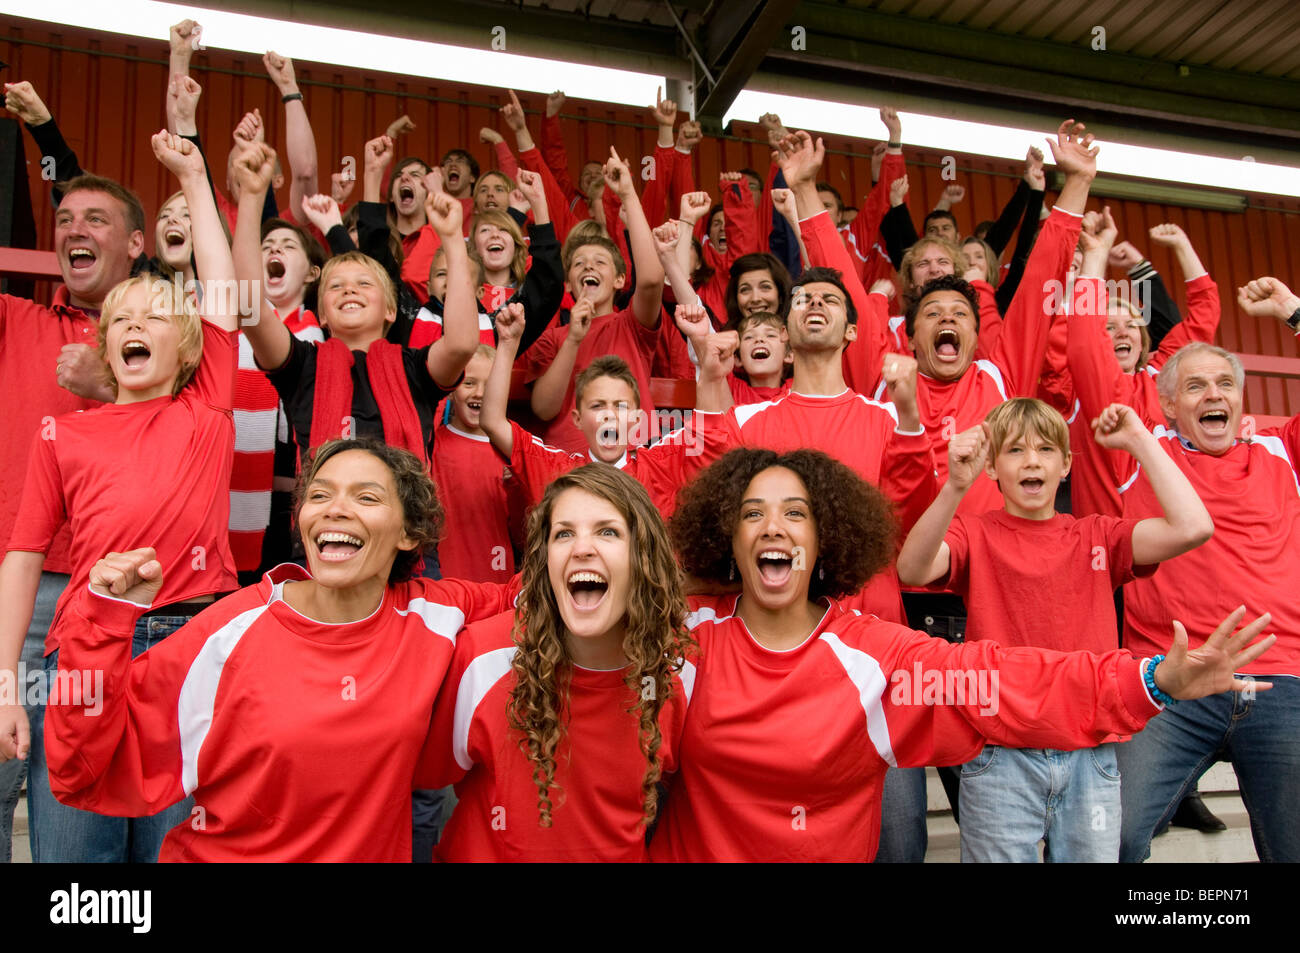 Groupe de supporters de football célèbre Photo Stock